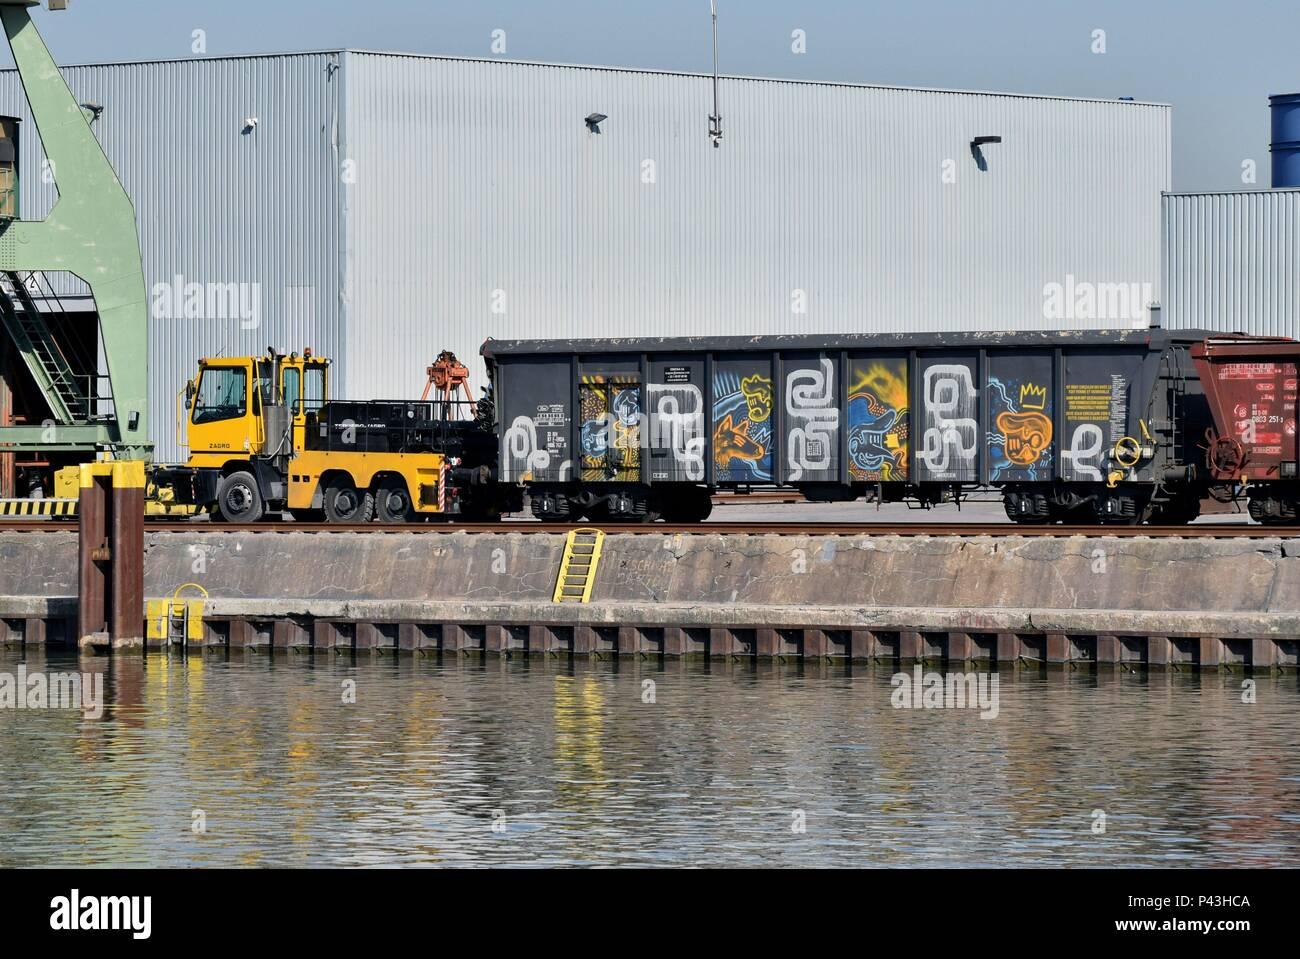 Graffiti on freight waggon on 13.03.2017 in Lünen - Germany. | usage worldwide - Stock Image